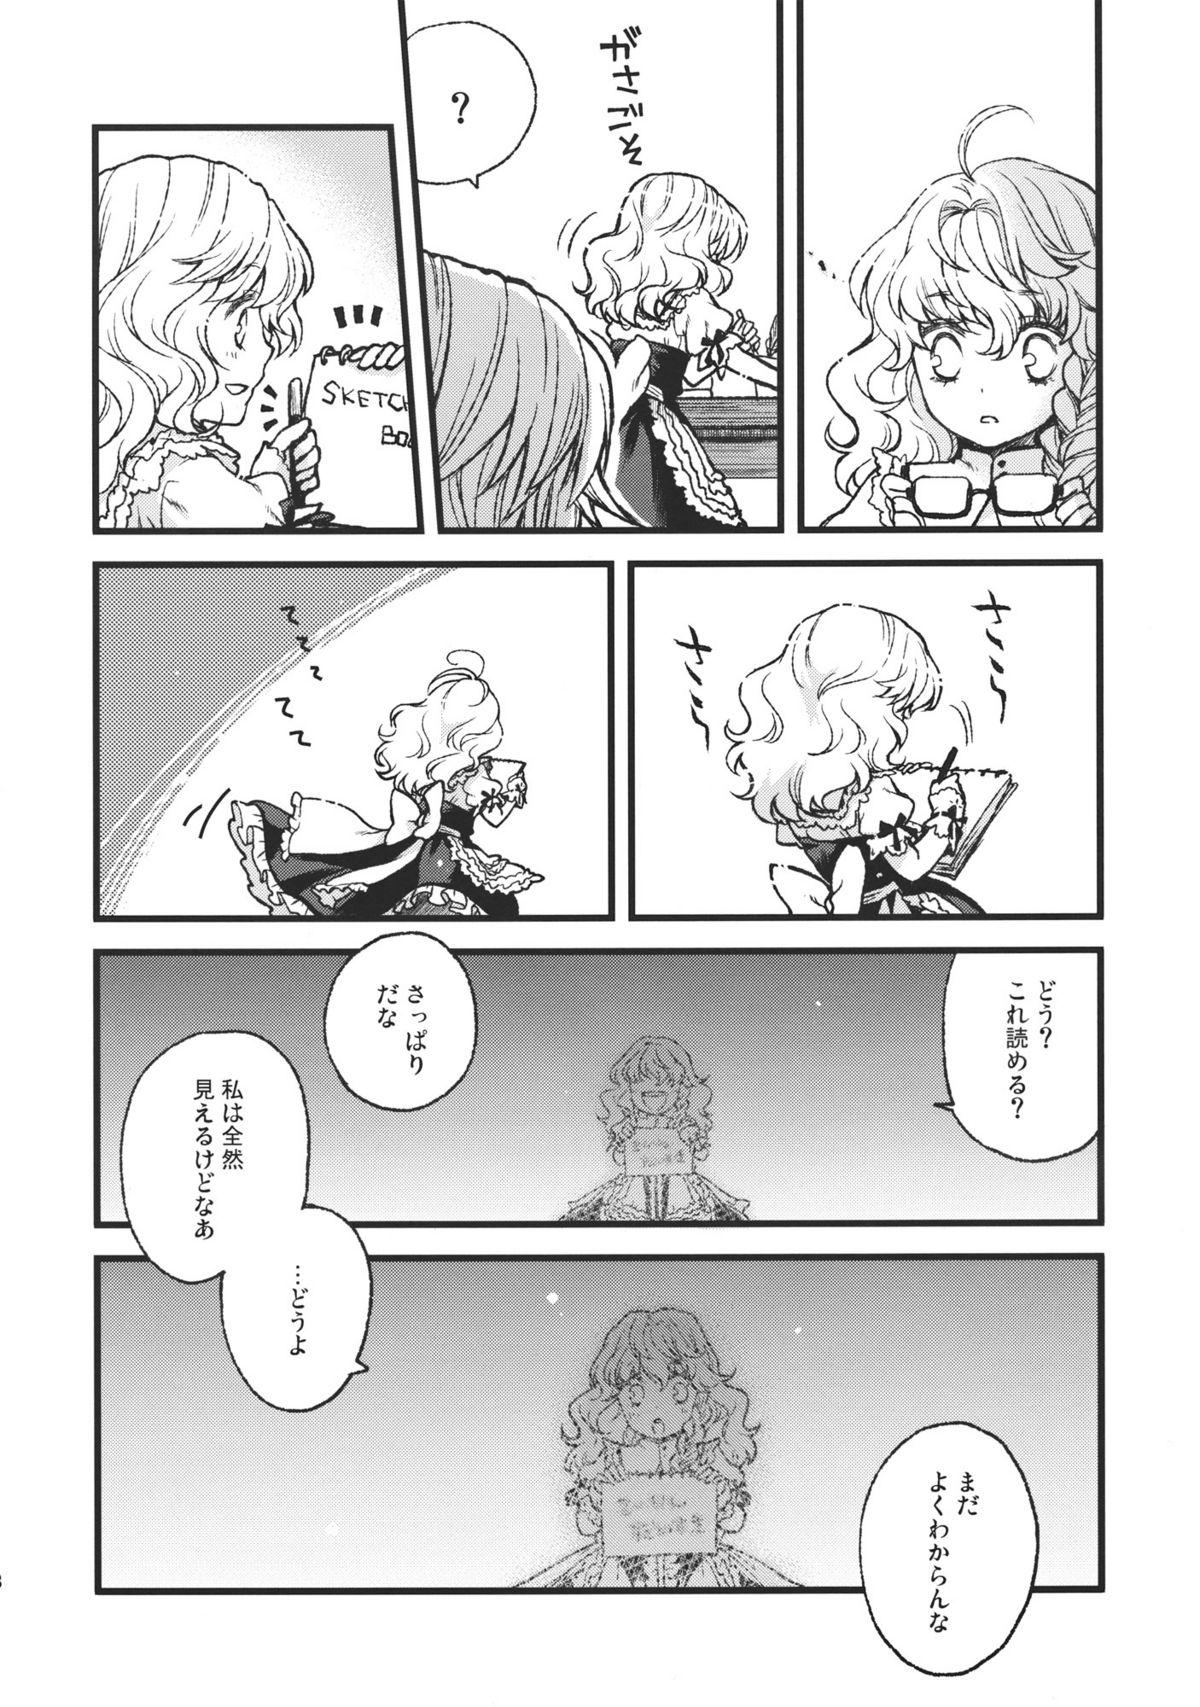 Koimegane / Iromegane 7